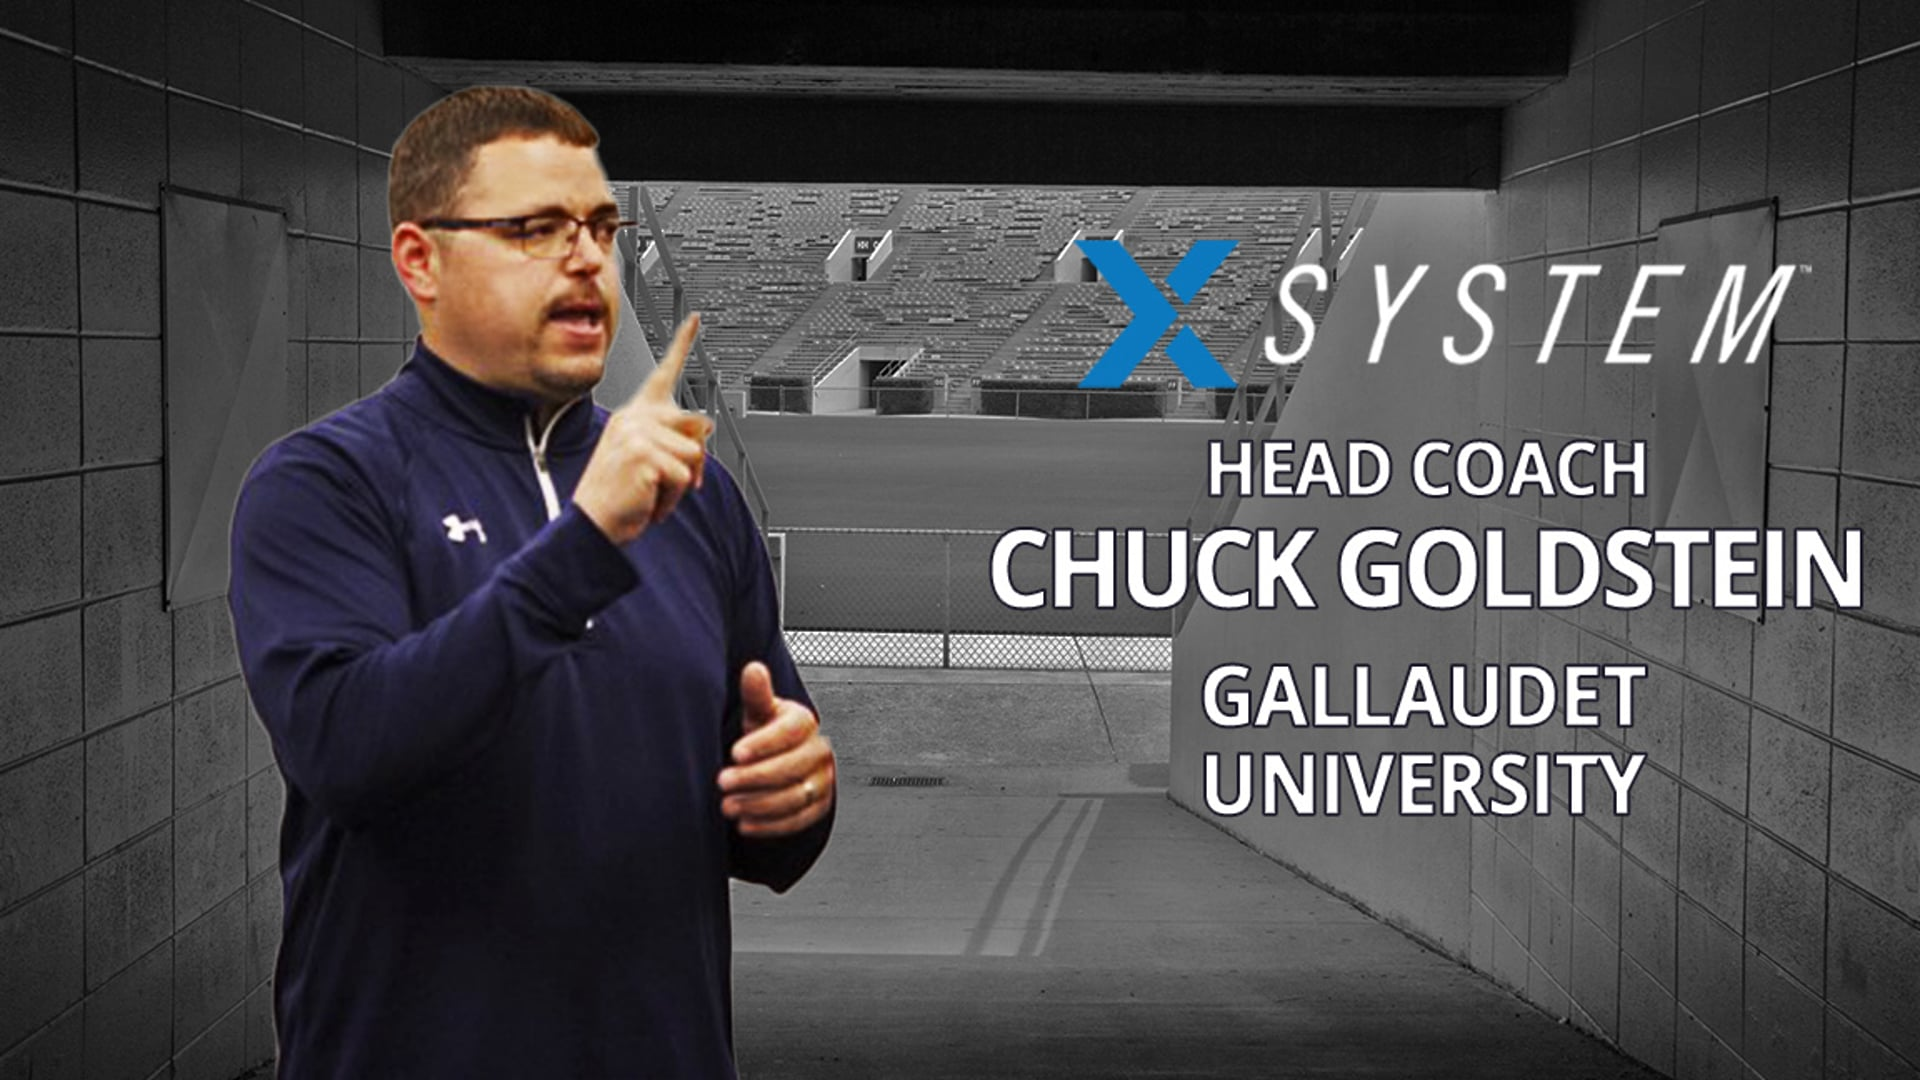 XSystem: Chuck Goldstein, Gallaudet University